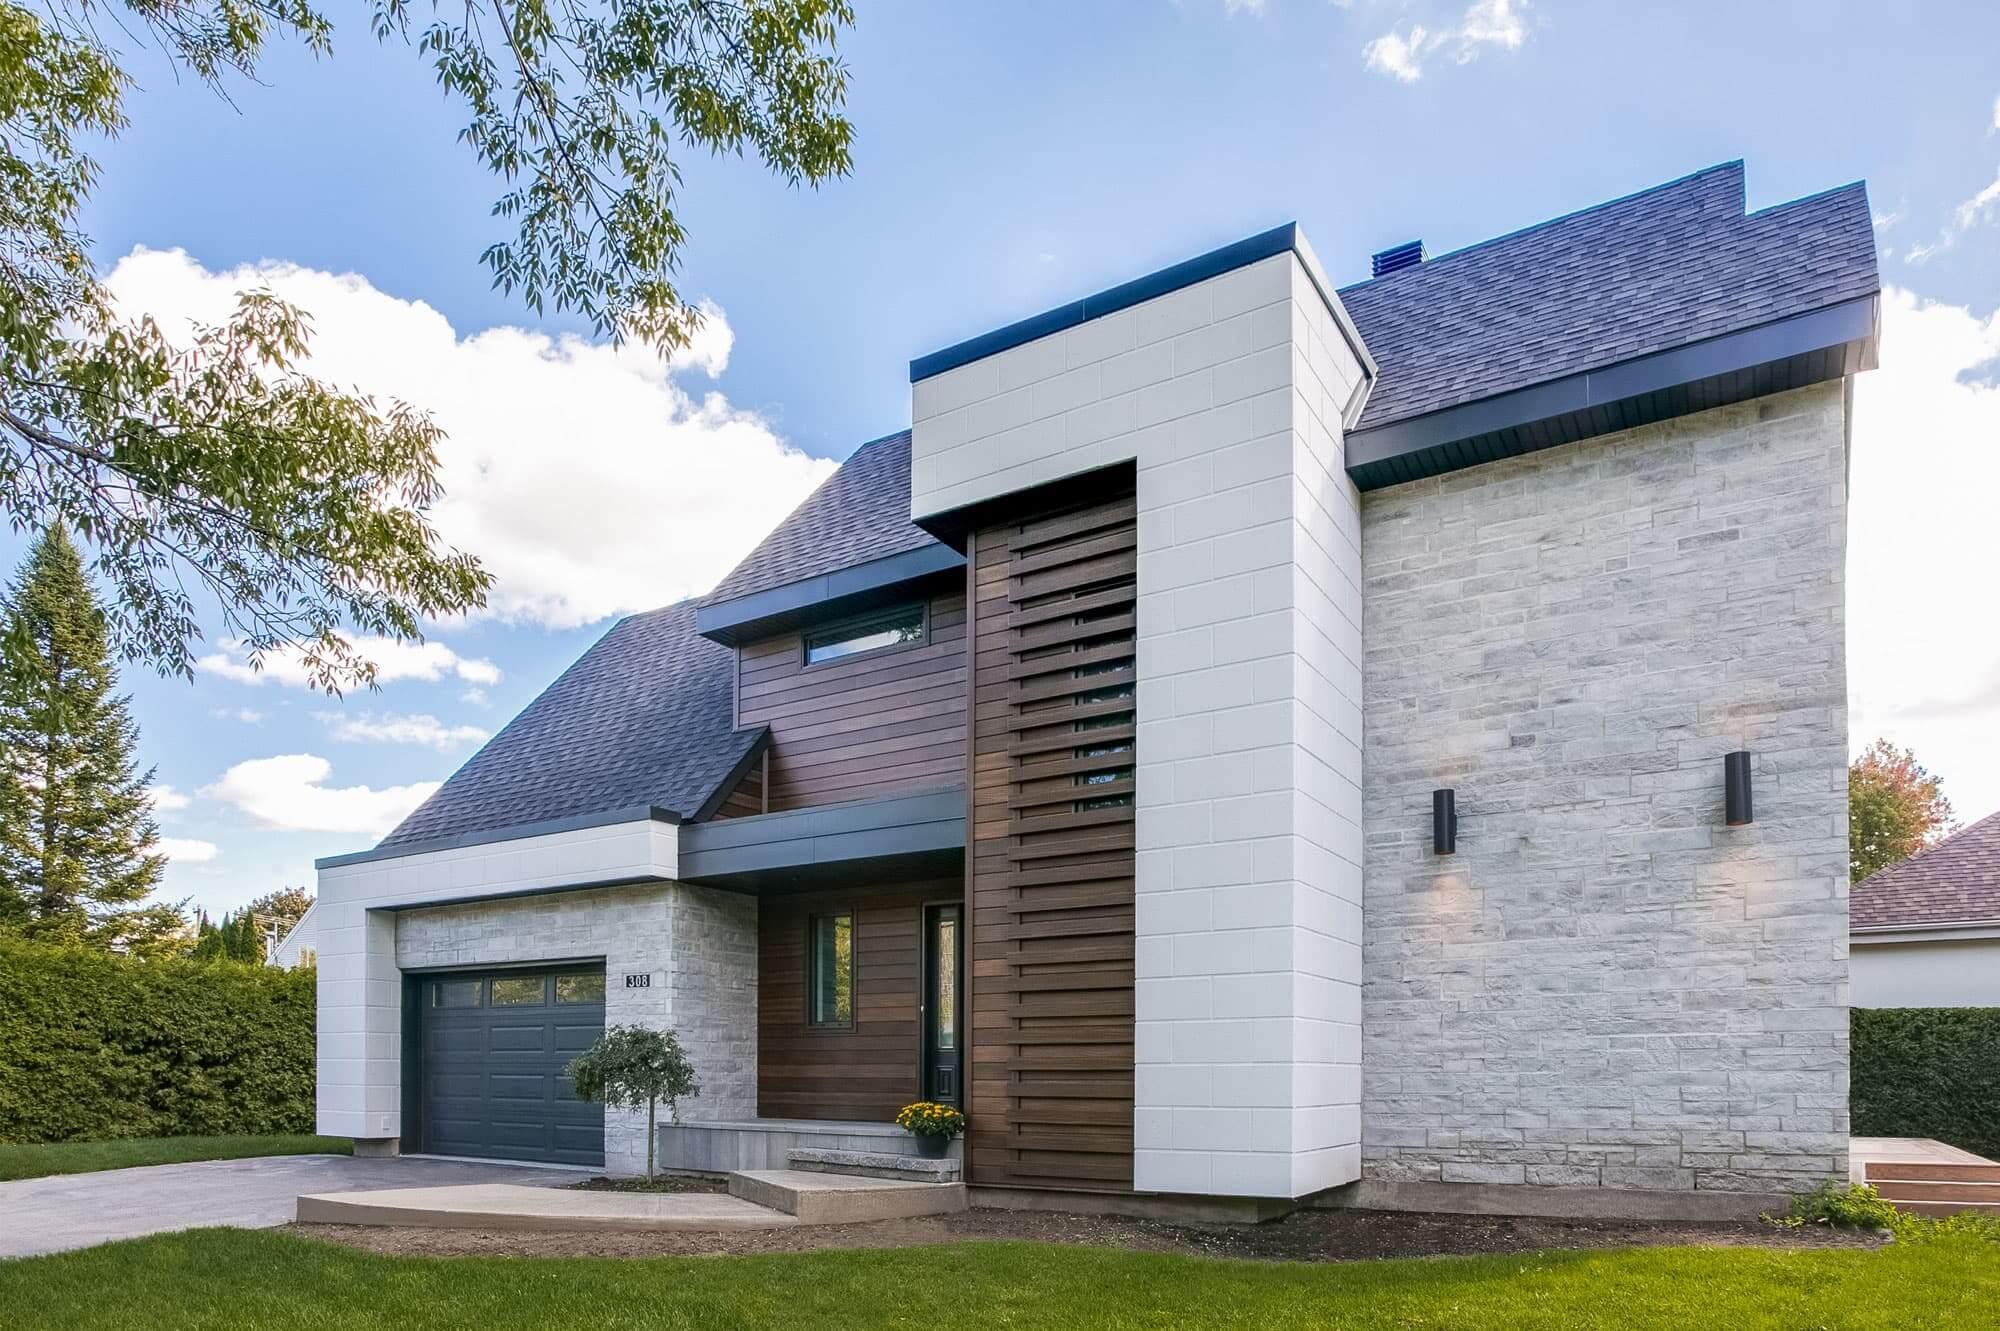 rénovation façade de maison de style moderne